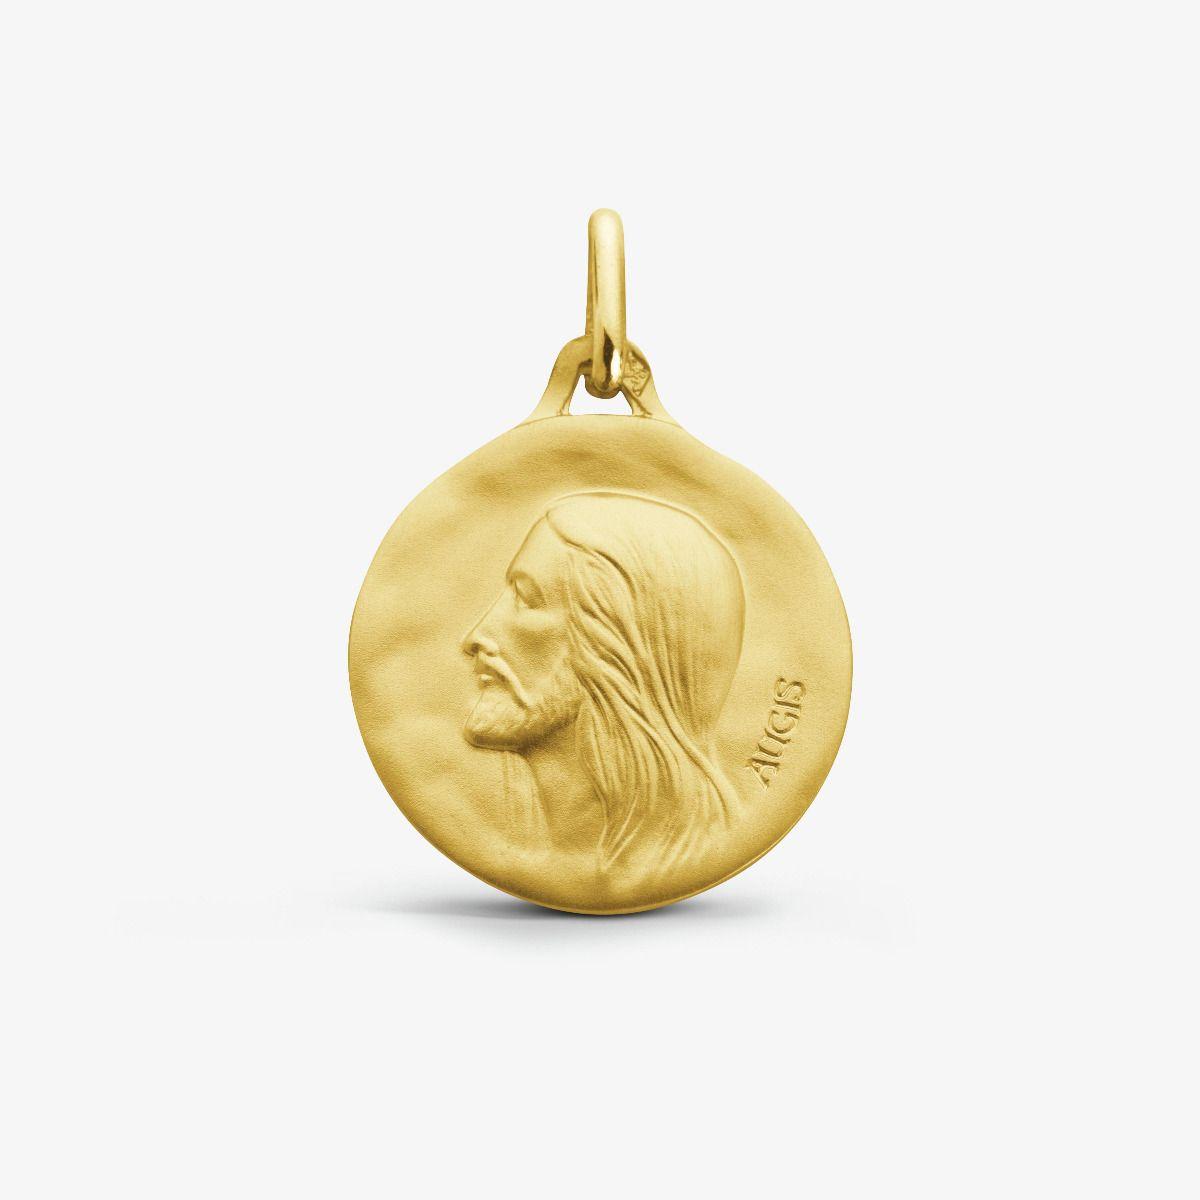 Médaille Christ Or Jaune 18 carats - 18 mm